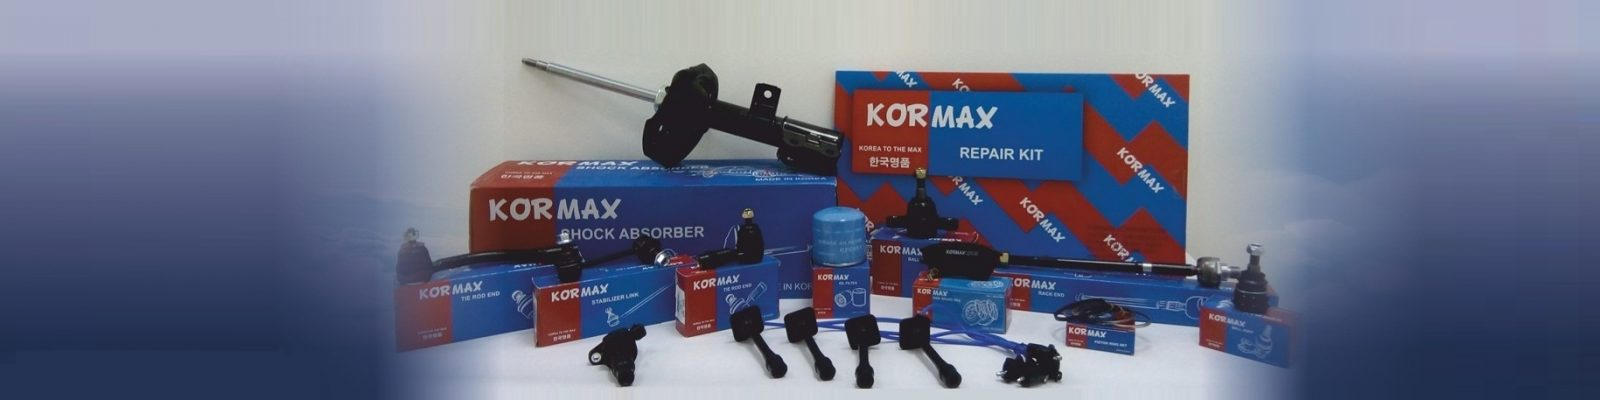 Баннер kormax 2